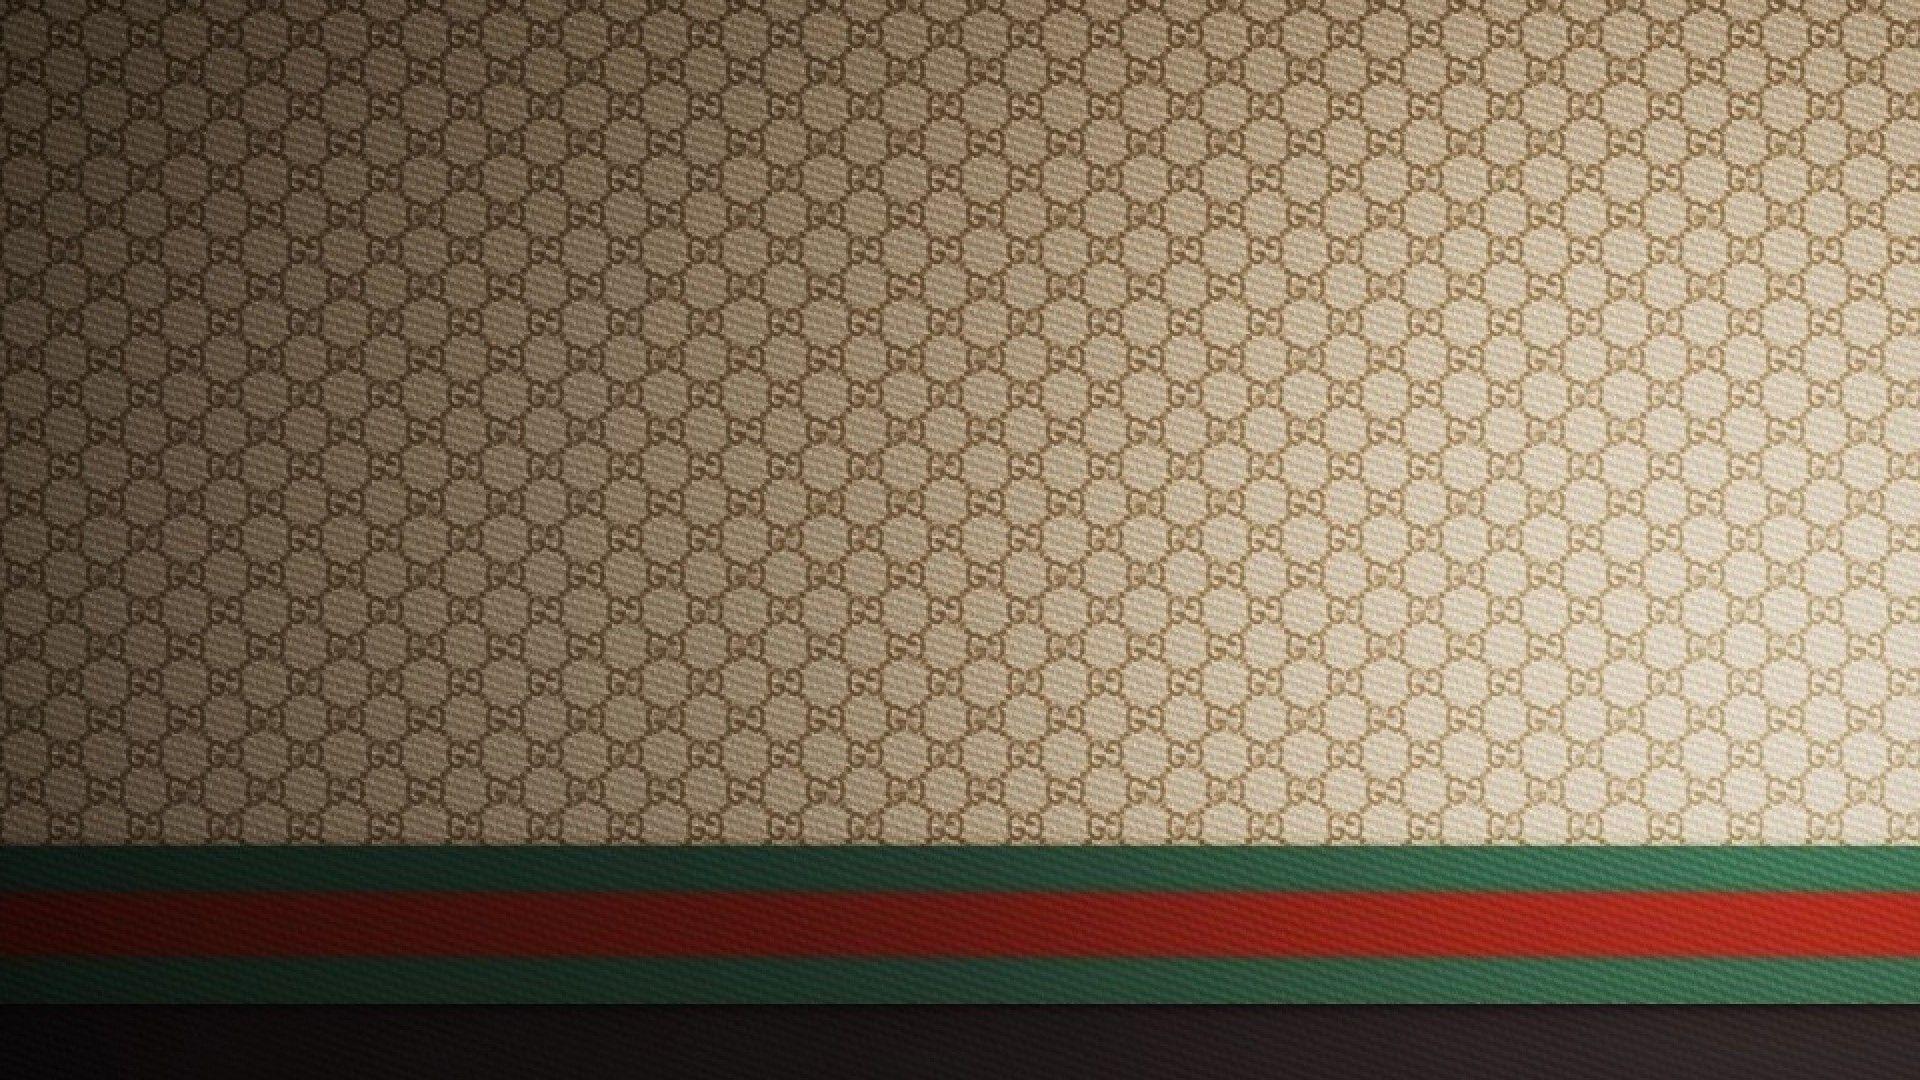 Gucci wallpapers HD download Design Gucci 1080p 1920x1080